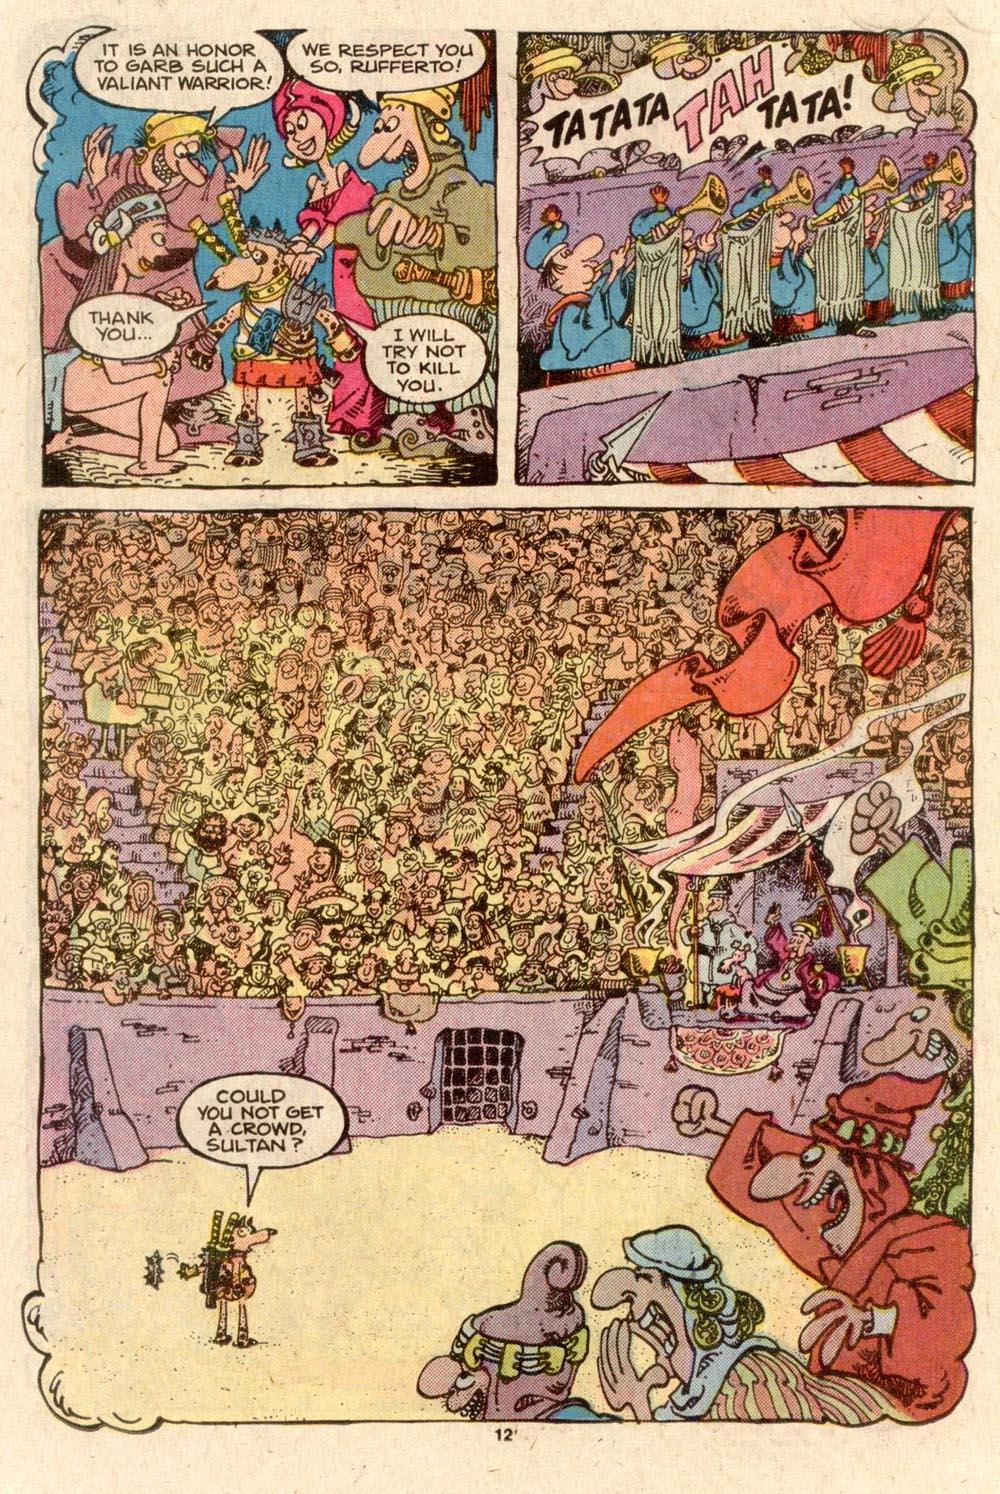 Read online Sergio Aragonés Groo the Wanderer comic -  Issue #44 - 12